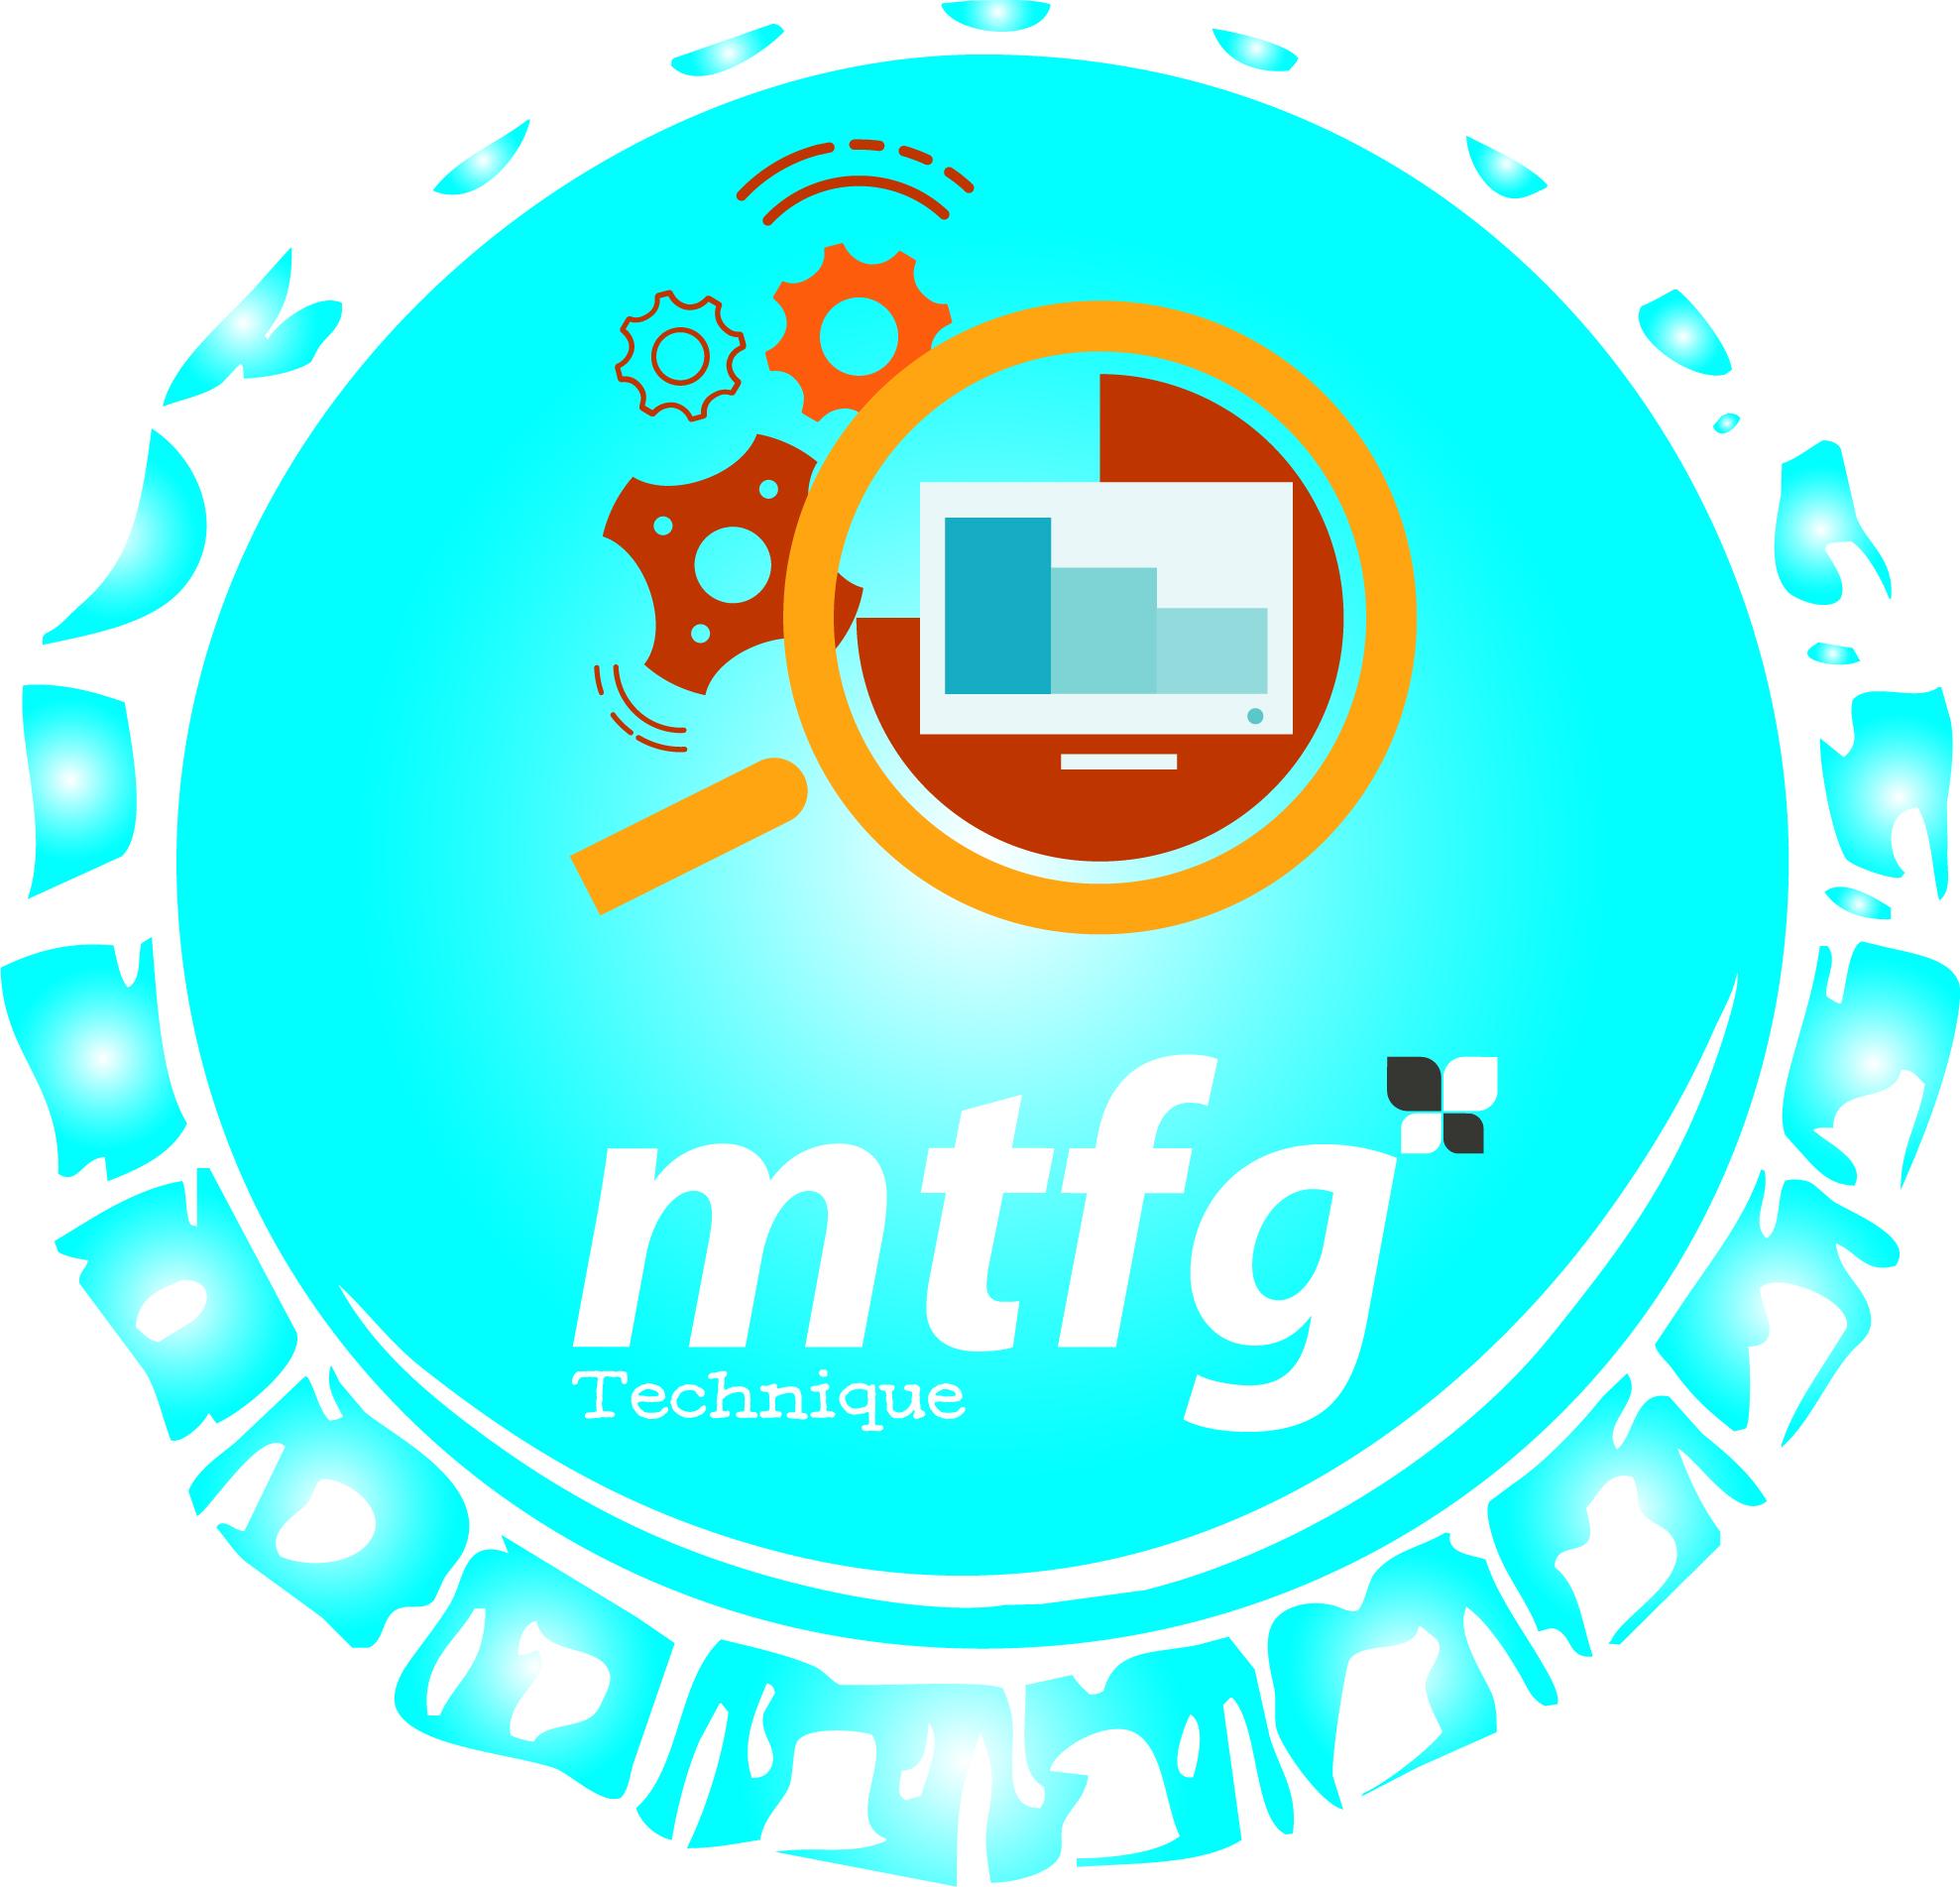 MTFG Technique